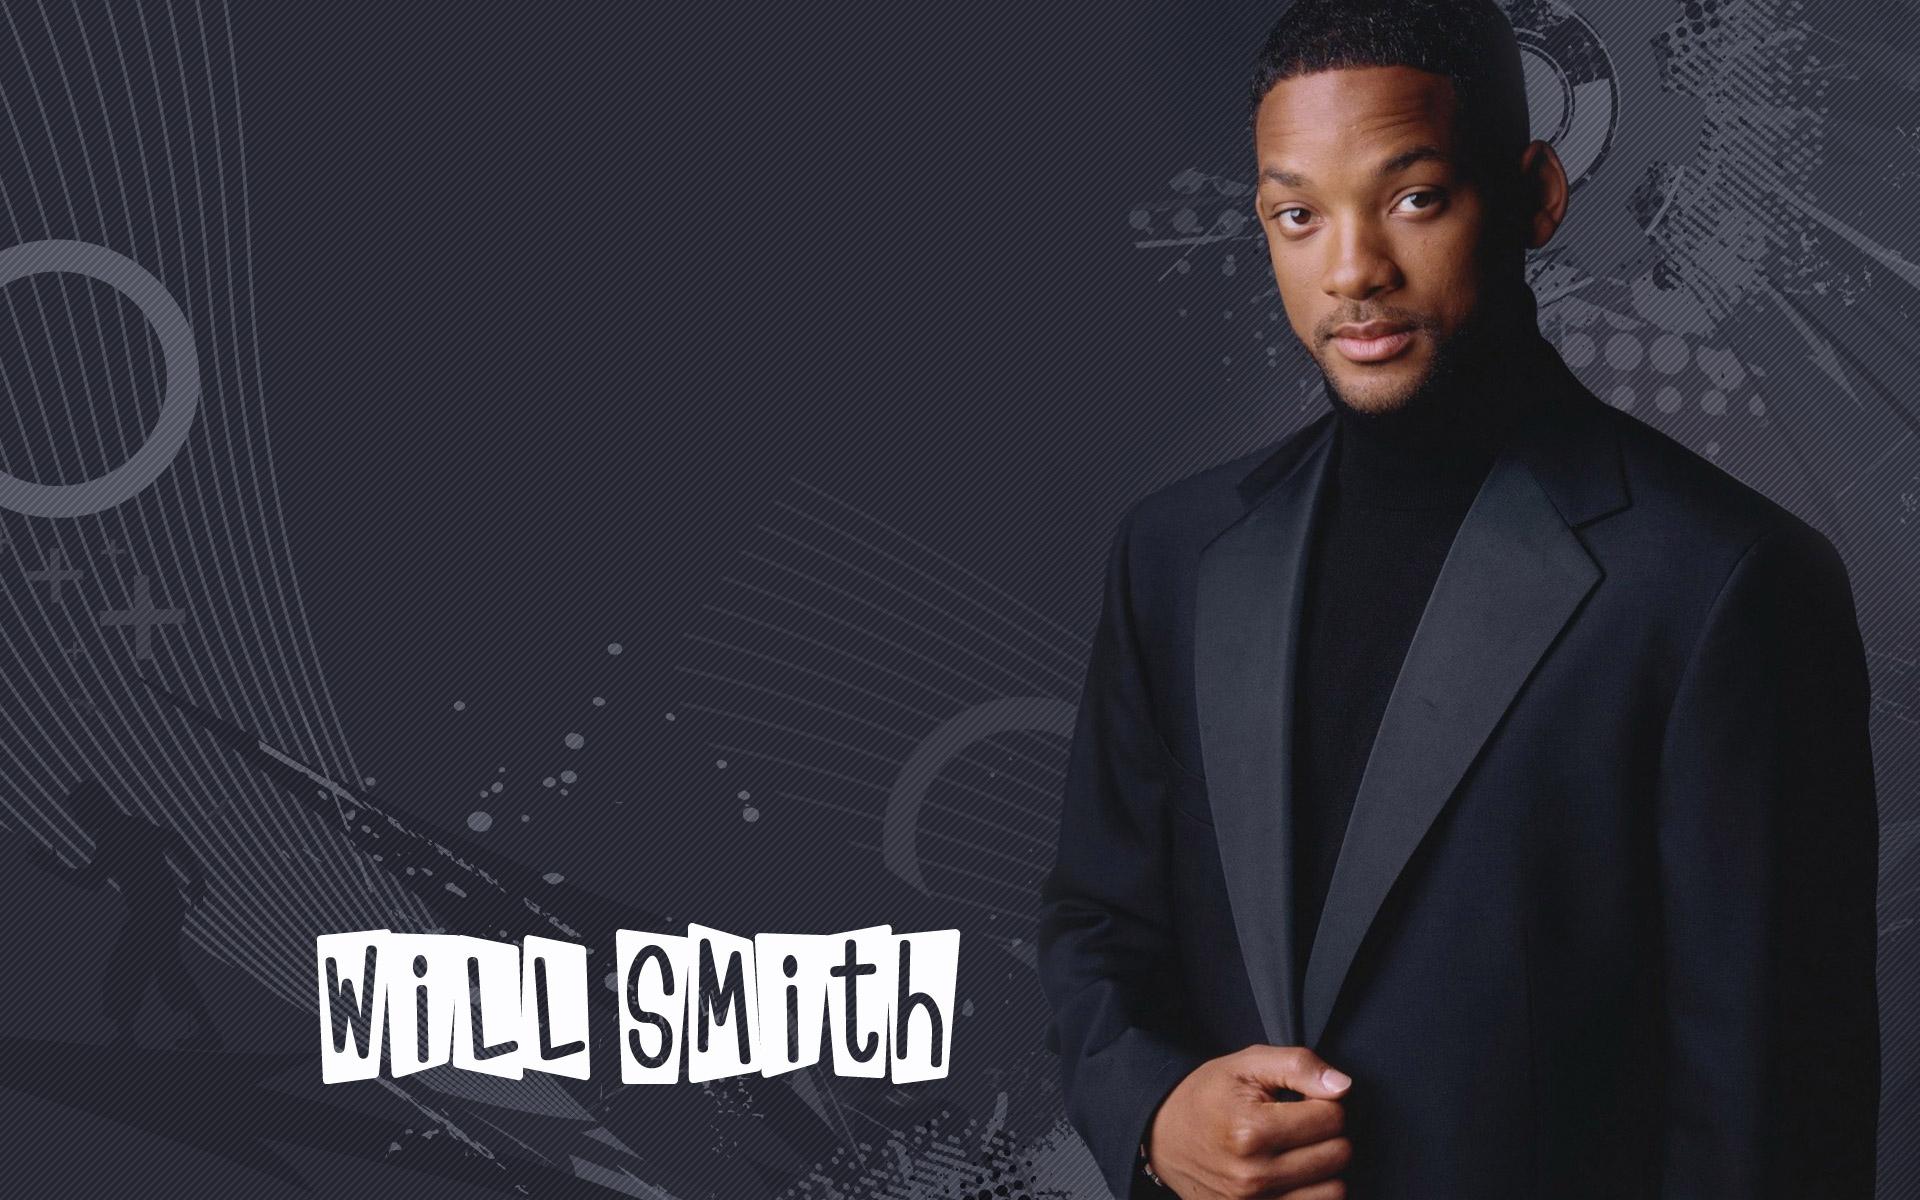 Will Smith Wallpaper 1